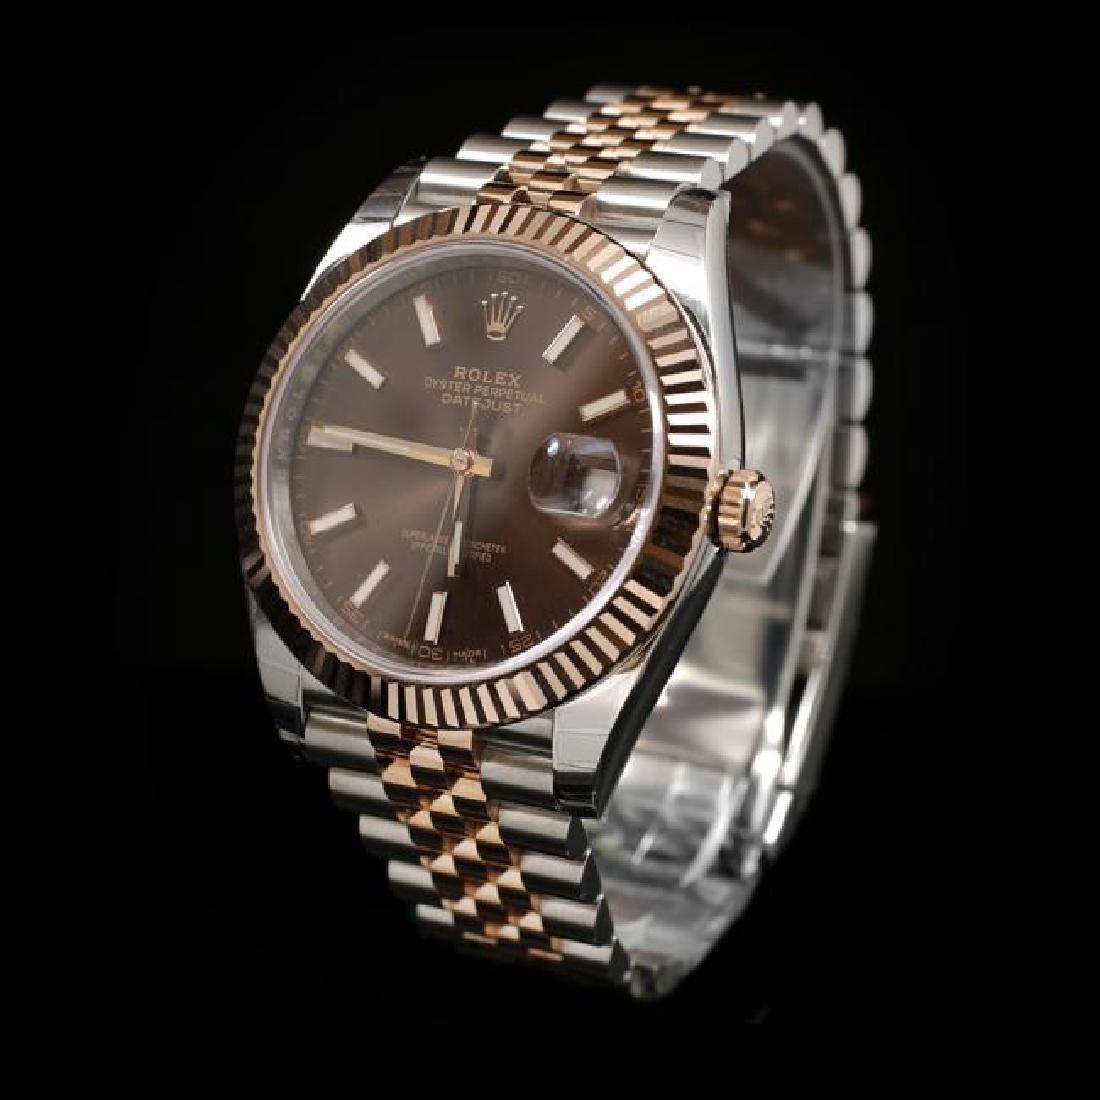 Rolex DateJust Two-Tone 41mm Men's Wristwatch - 2